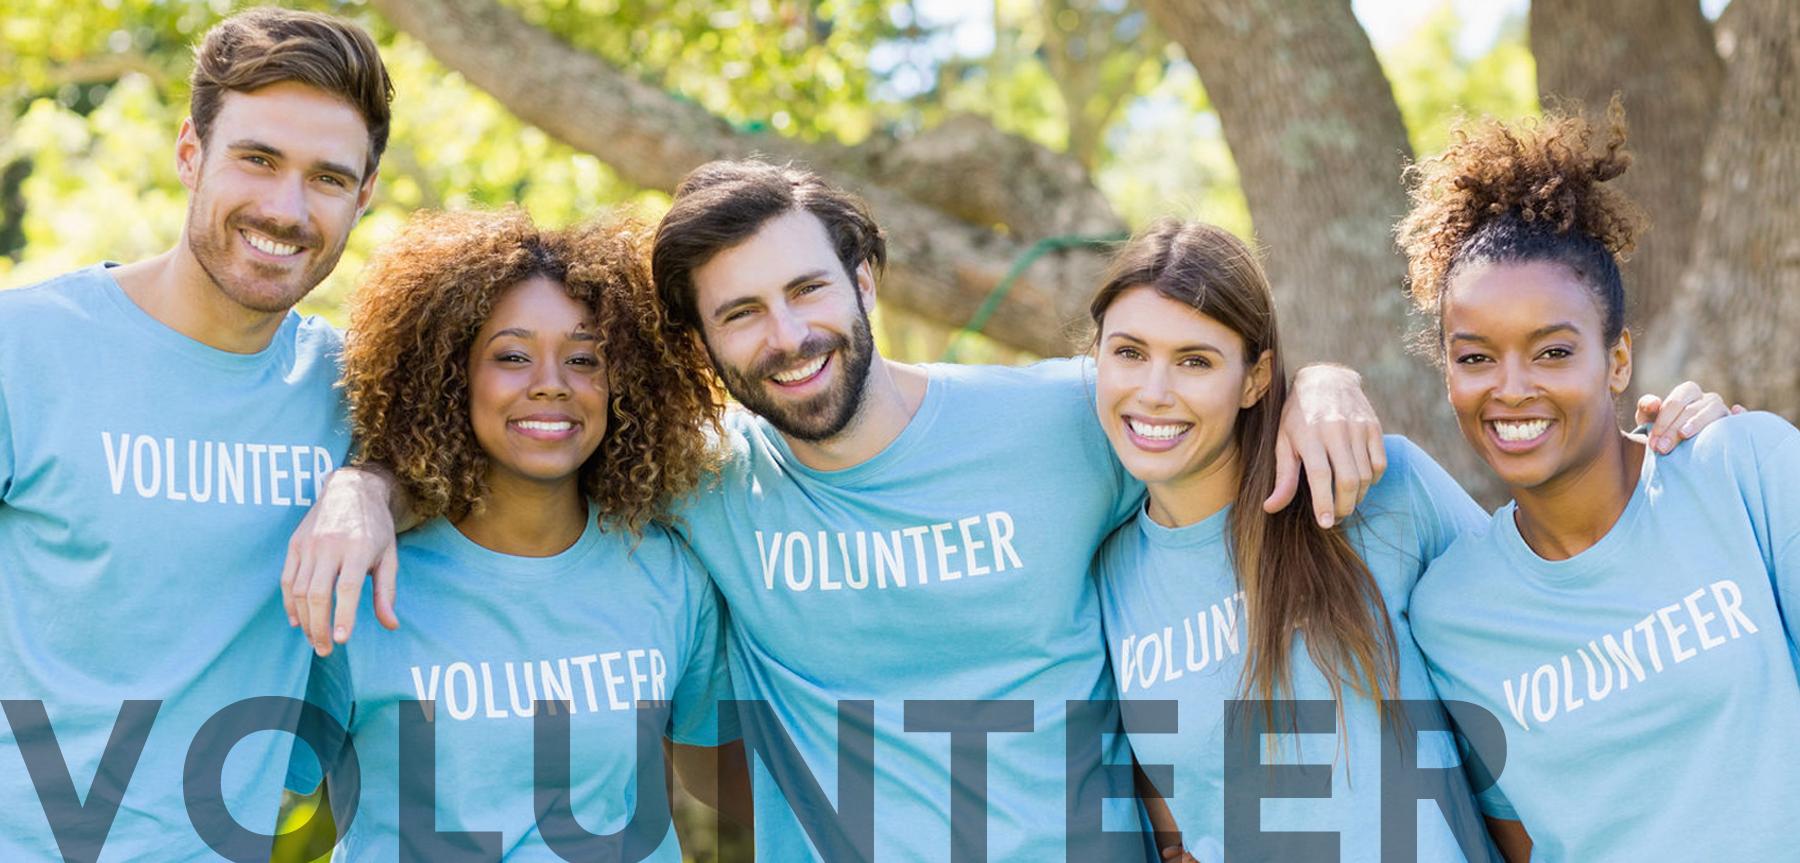 volunteer-wide_v2b